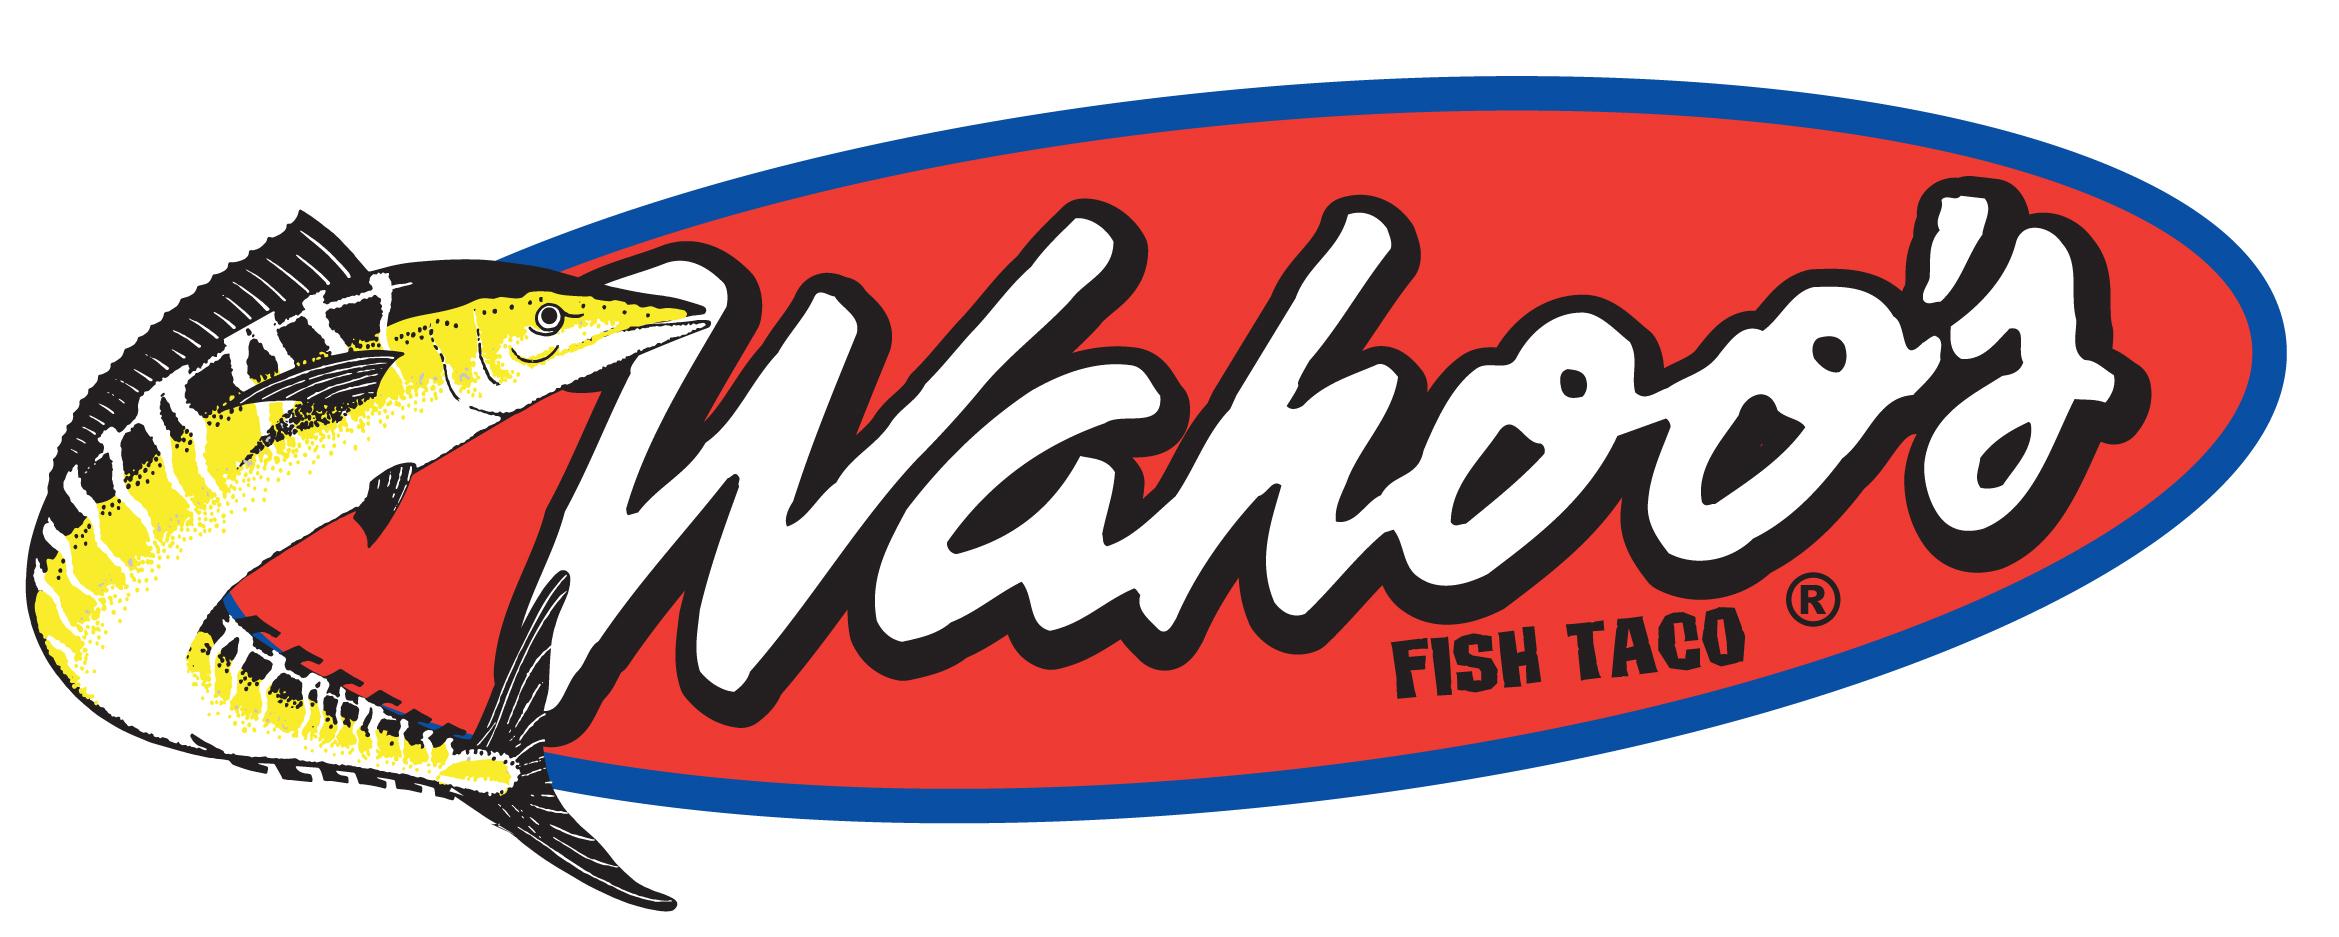 Wahoo 39 s fish taco for Wahoo fish taco